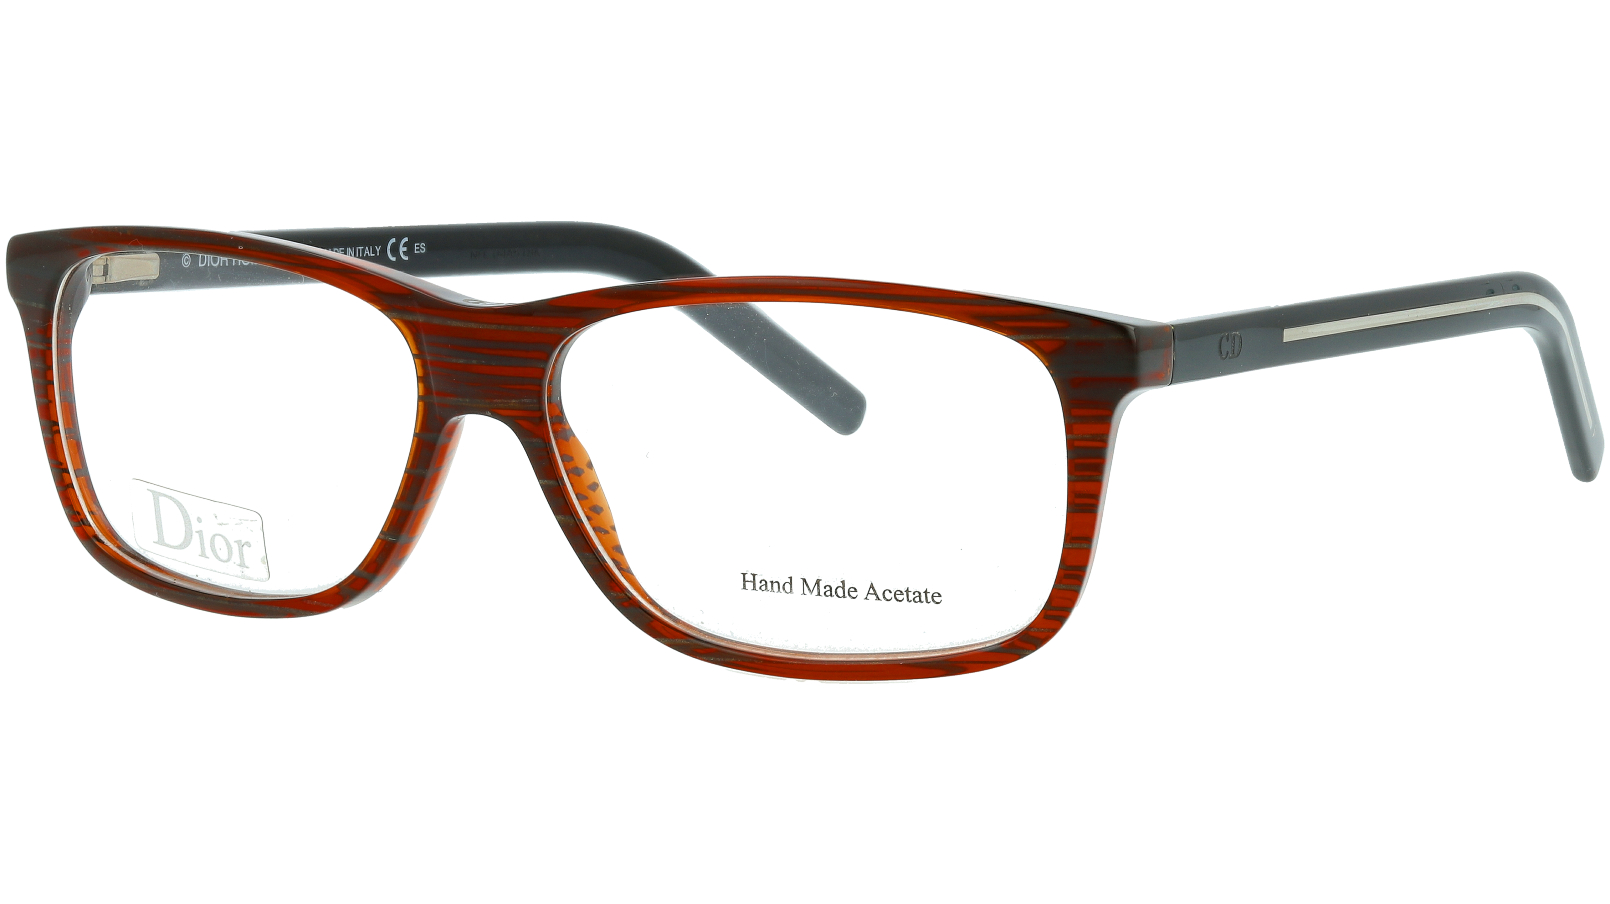 DIOR HOMME BLACKTIE123 66O 53 BROWN Glasses